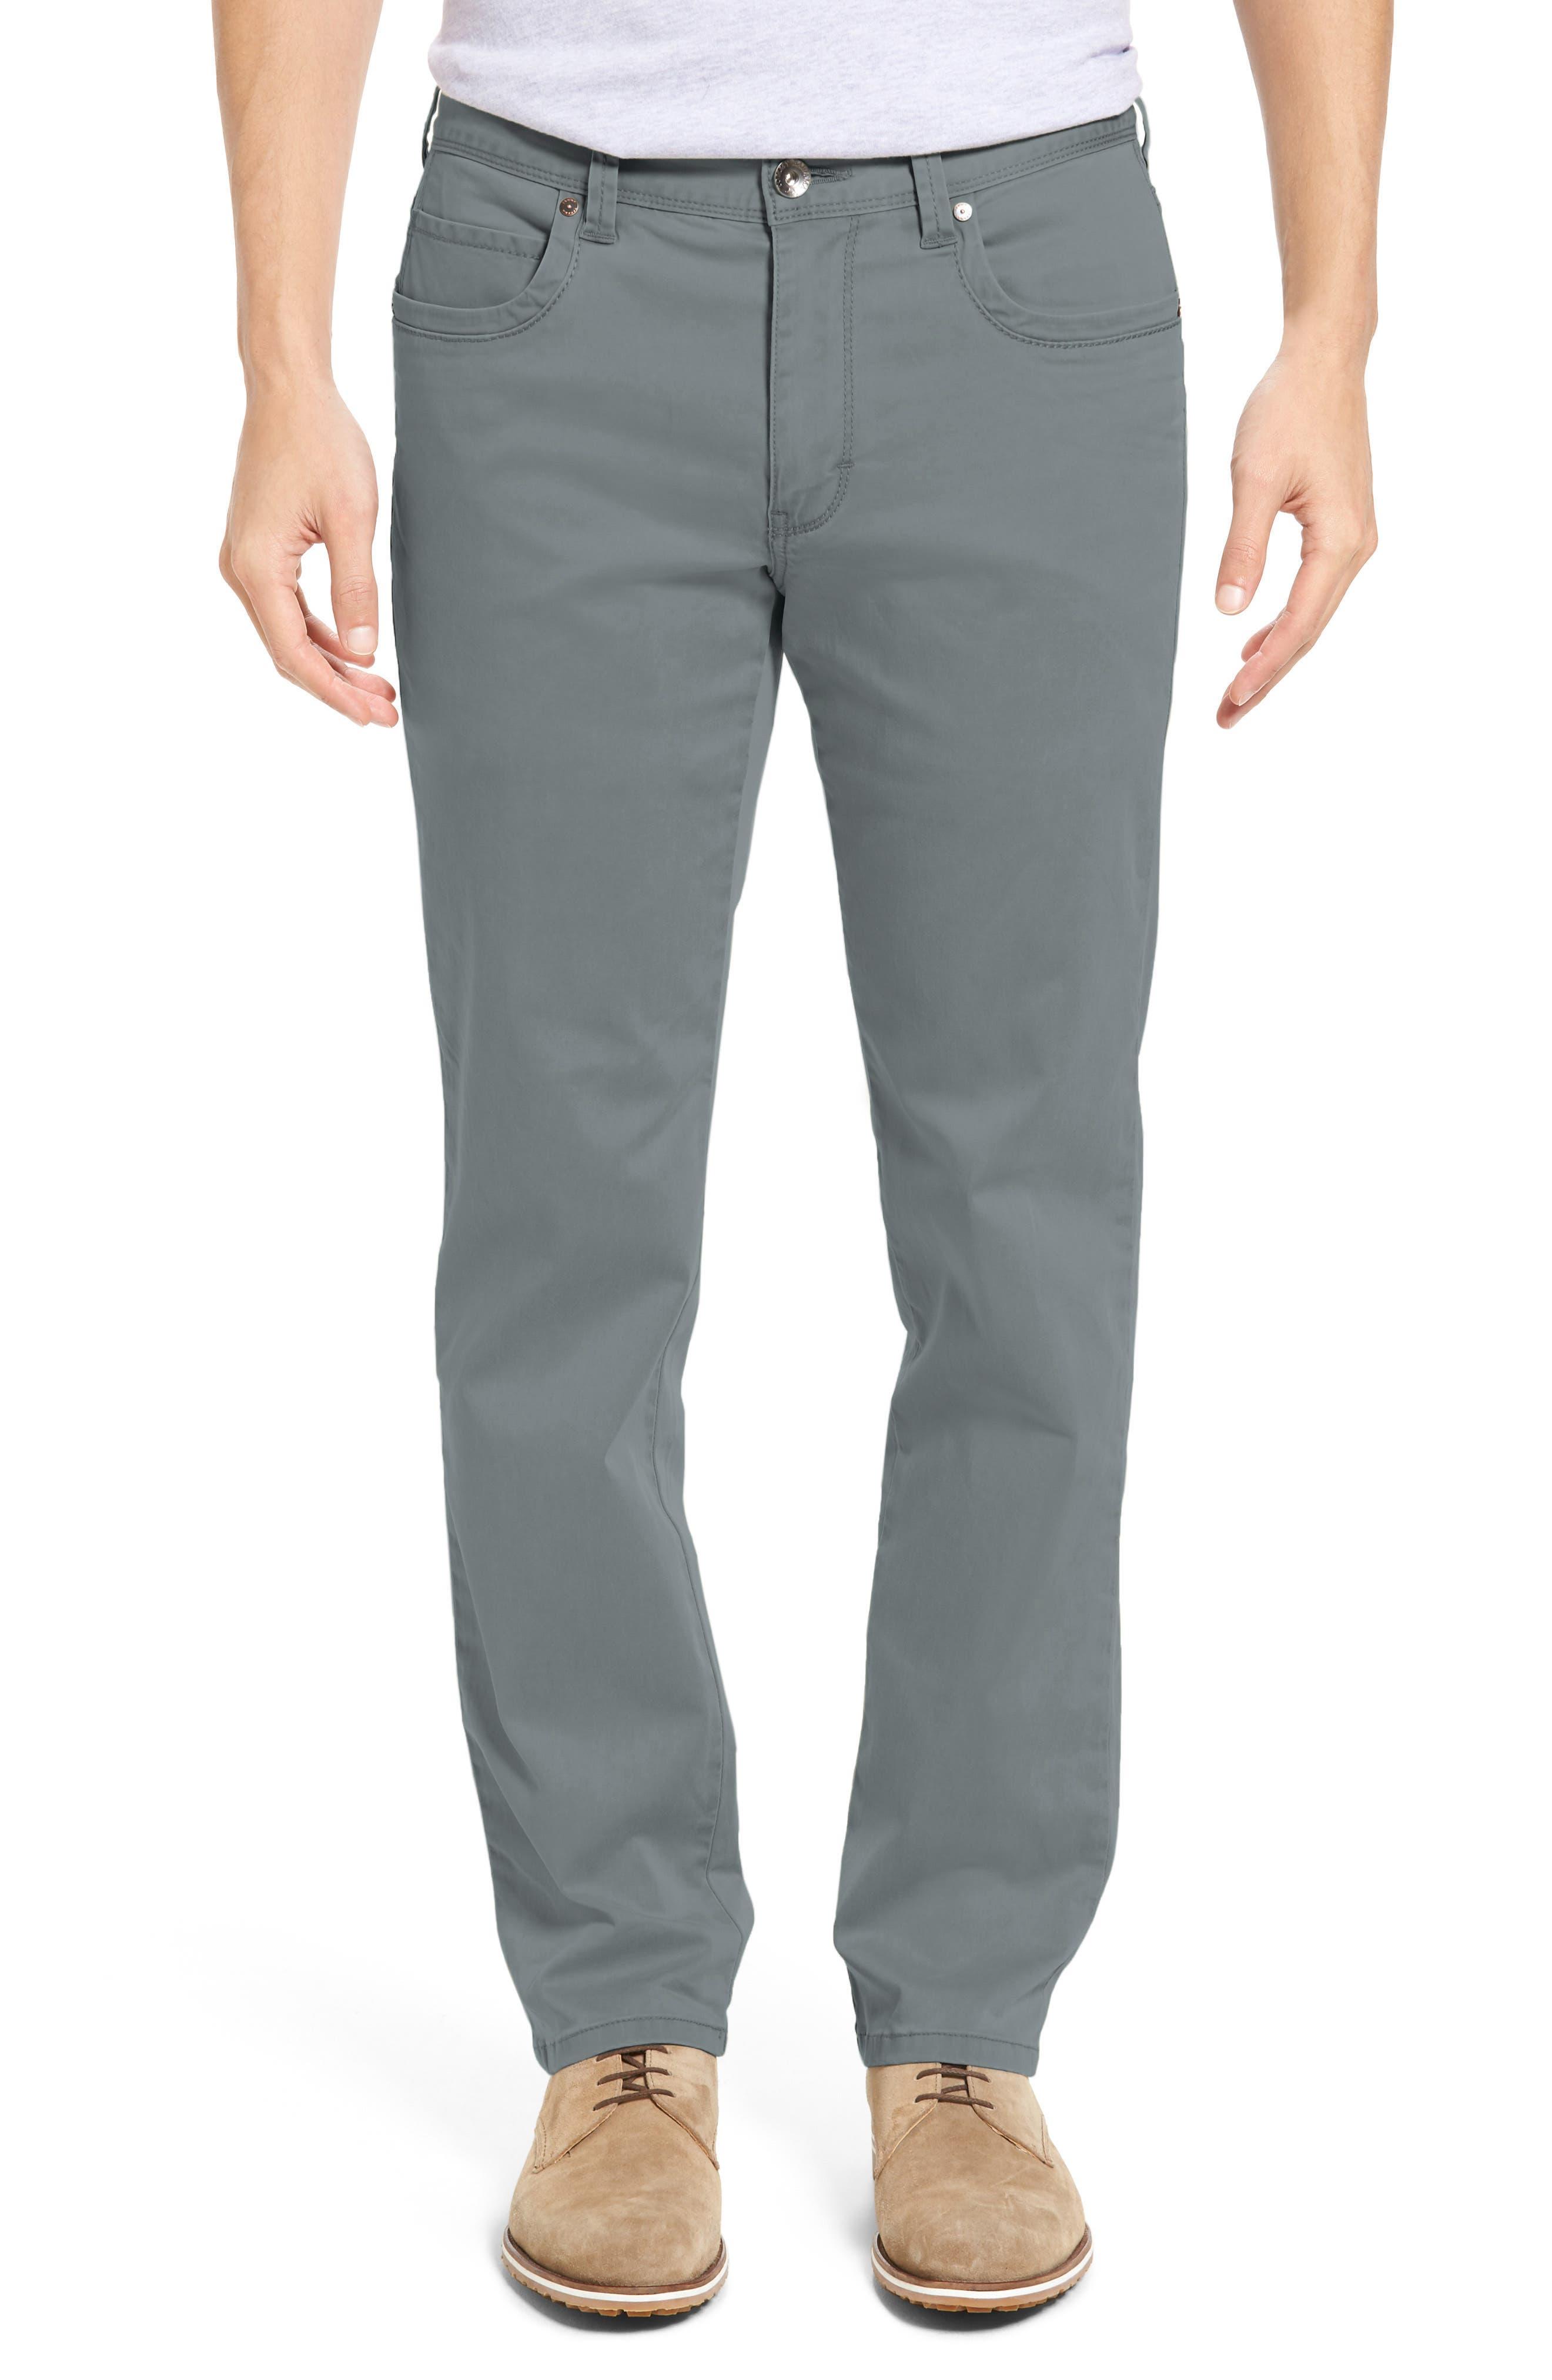 Tommy Bahama Boracay Pants (Regular & Big)